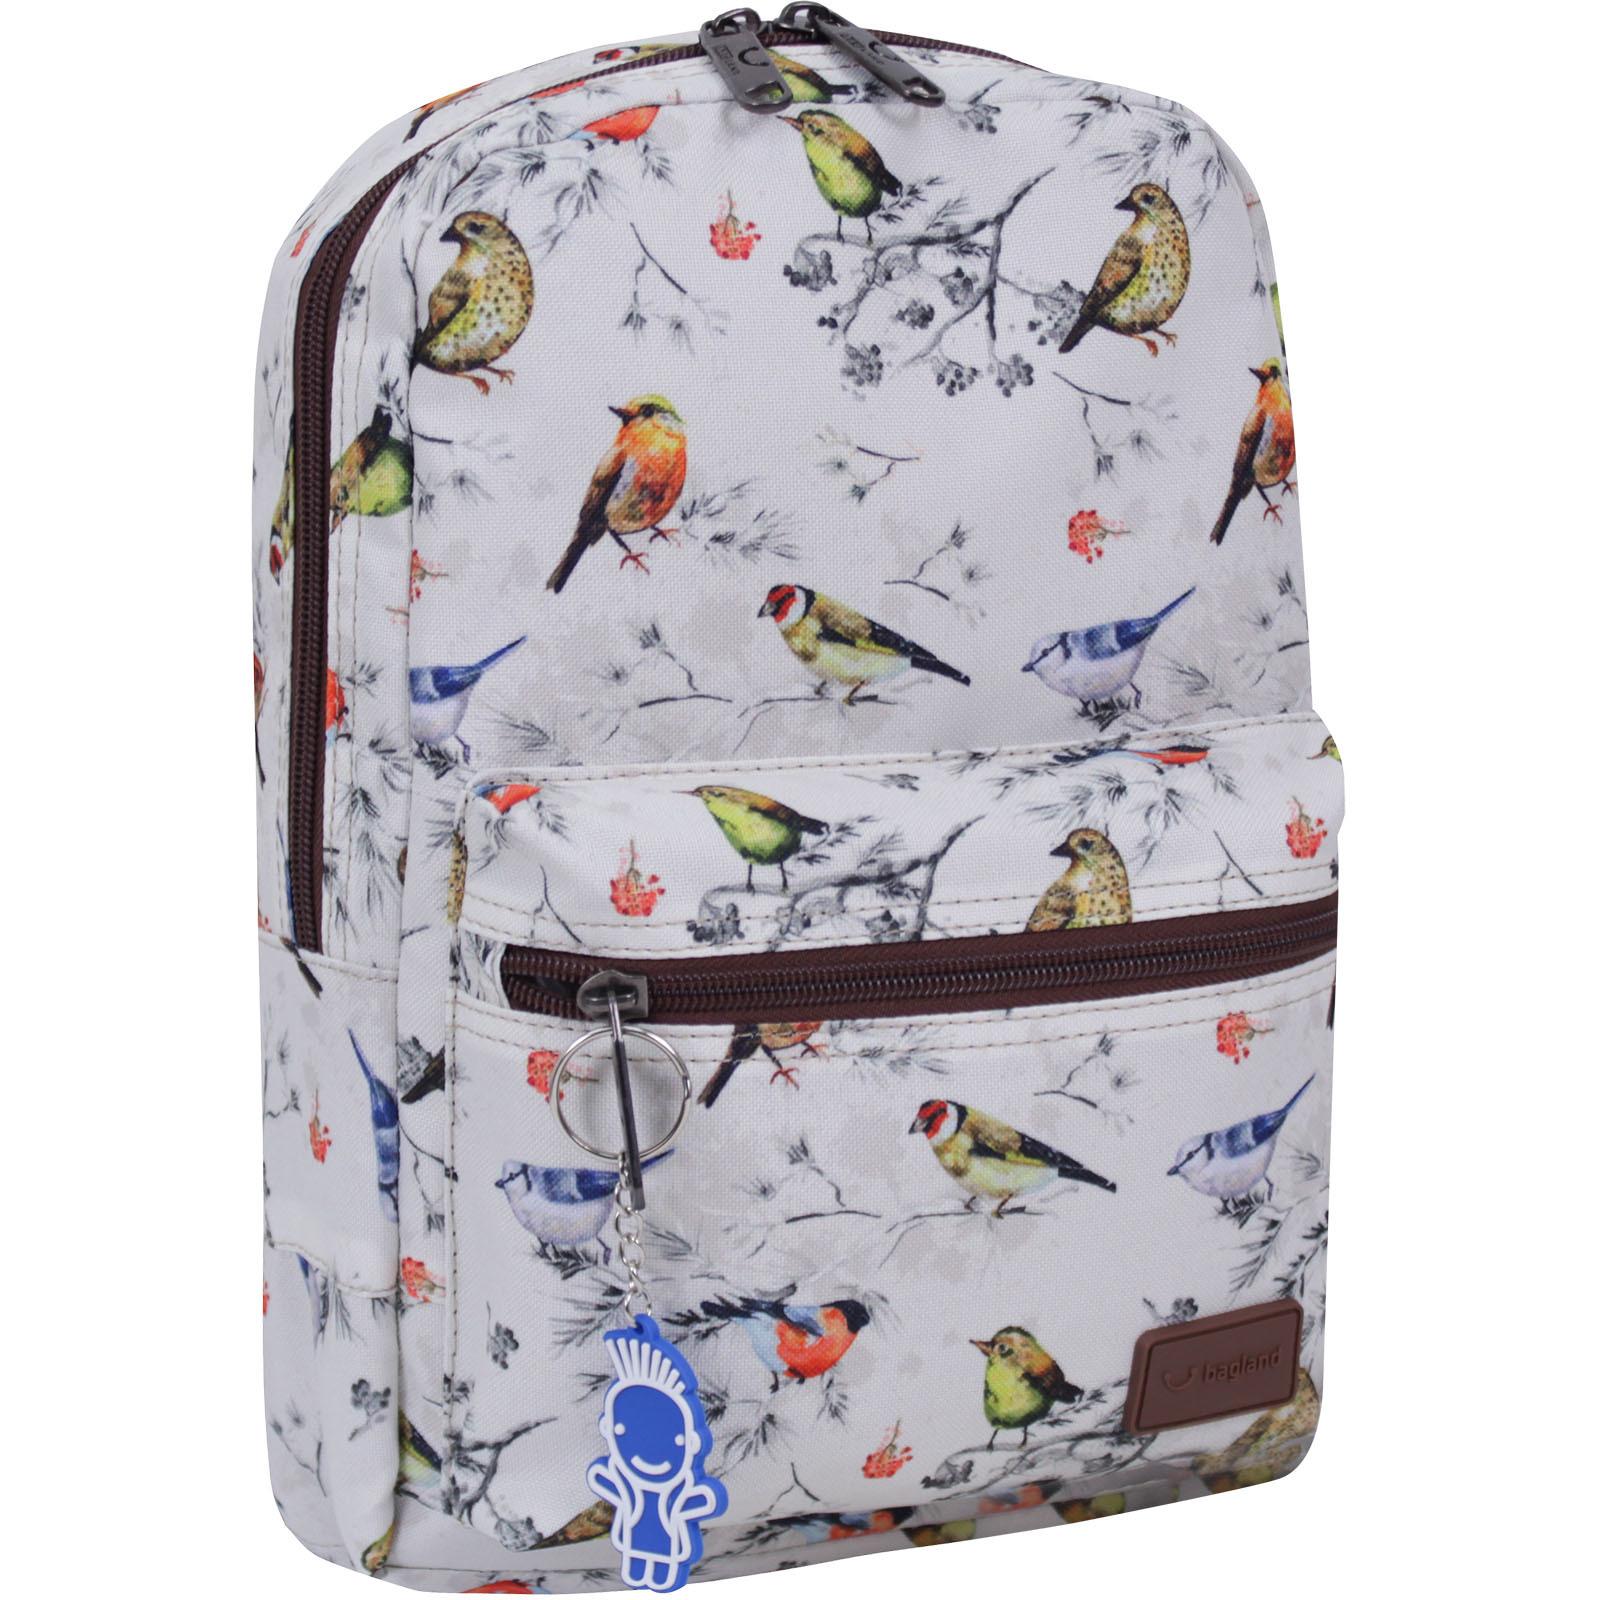 Детские рюкзаки Рюкзак Bagland Молодежный mini 8 л. сублімація 67 (00508664) IMG_8192суб67-1600.jpg